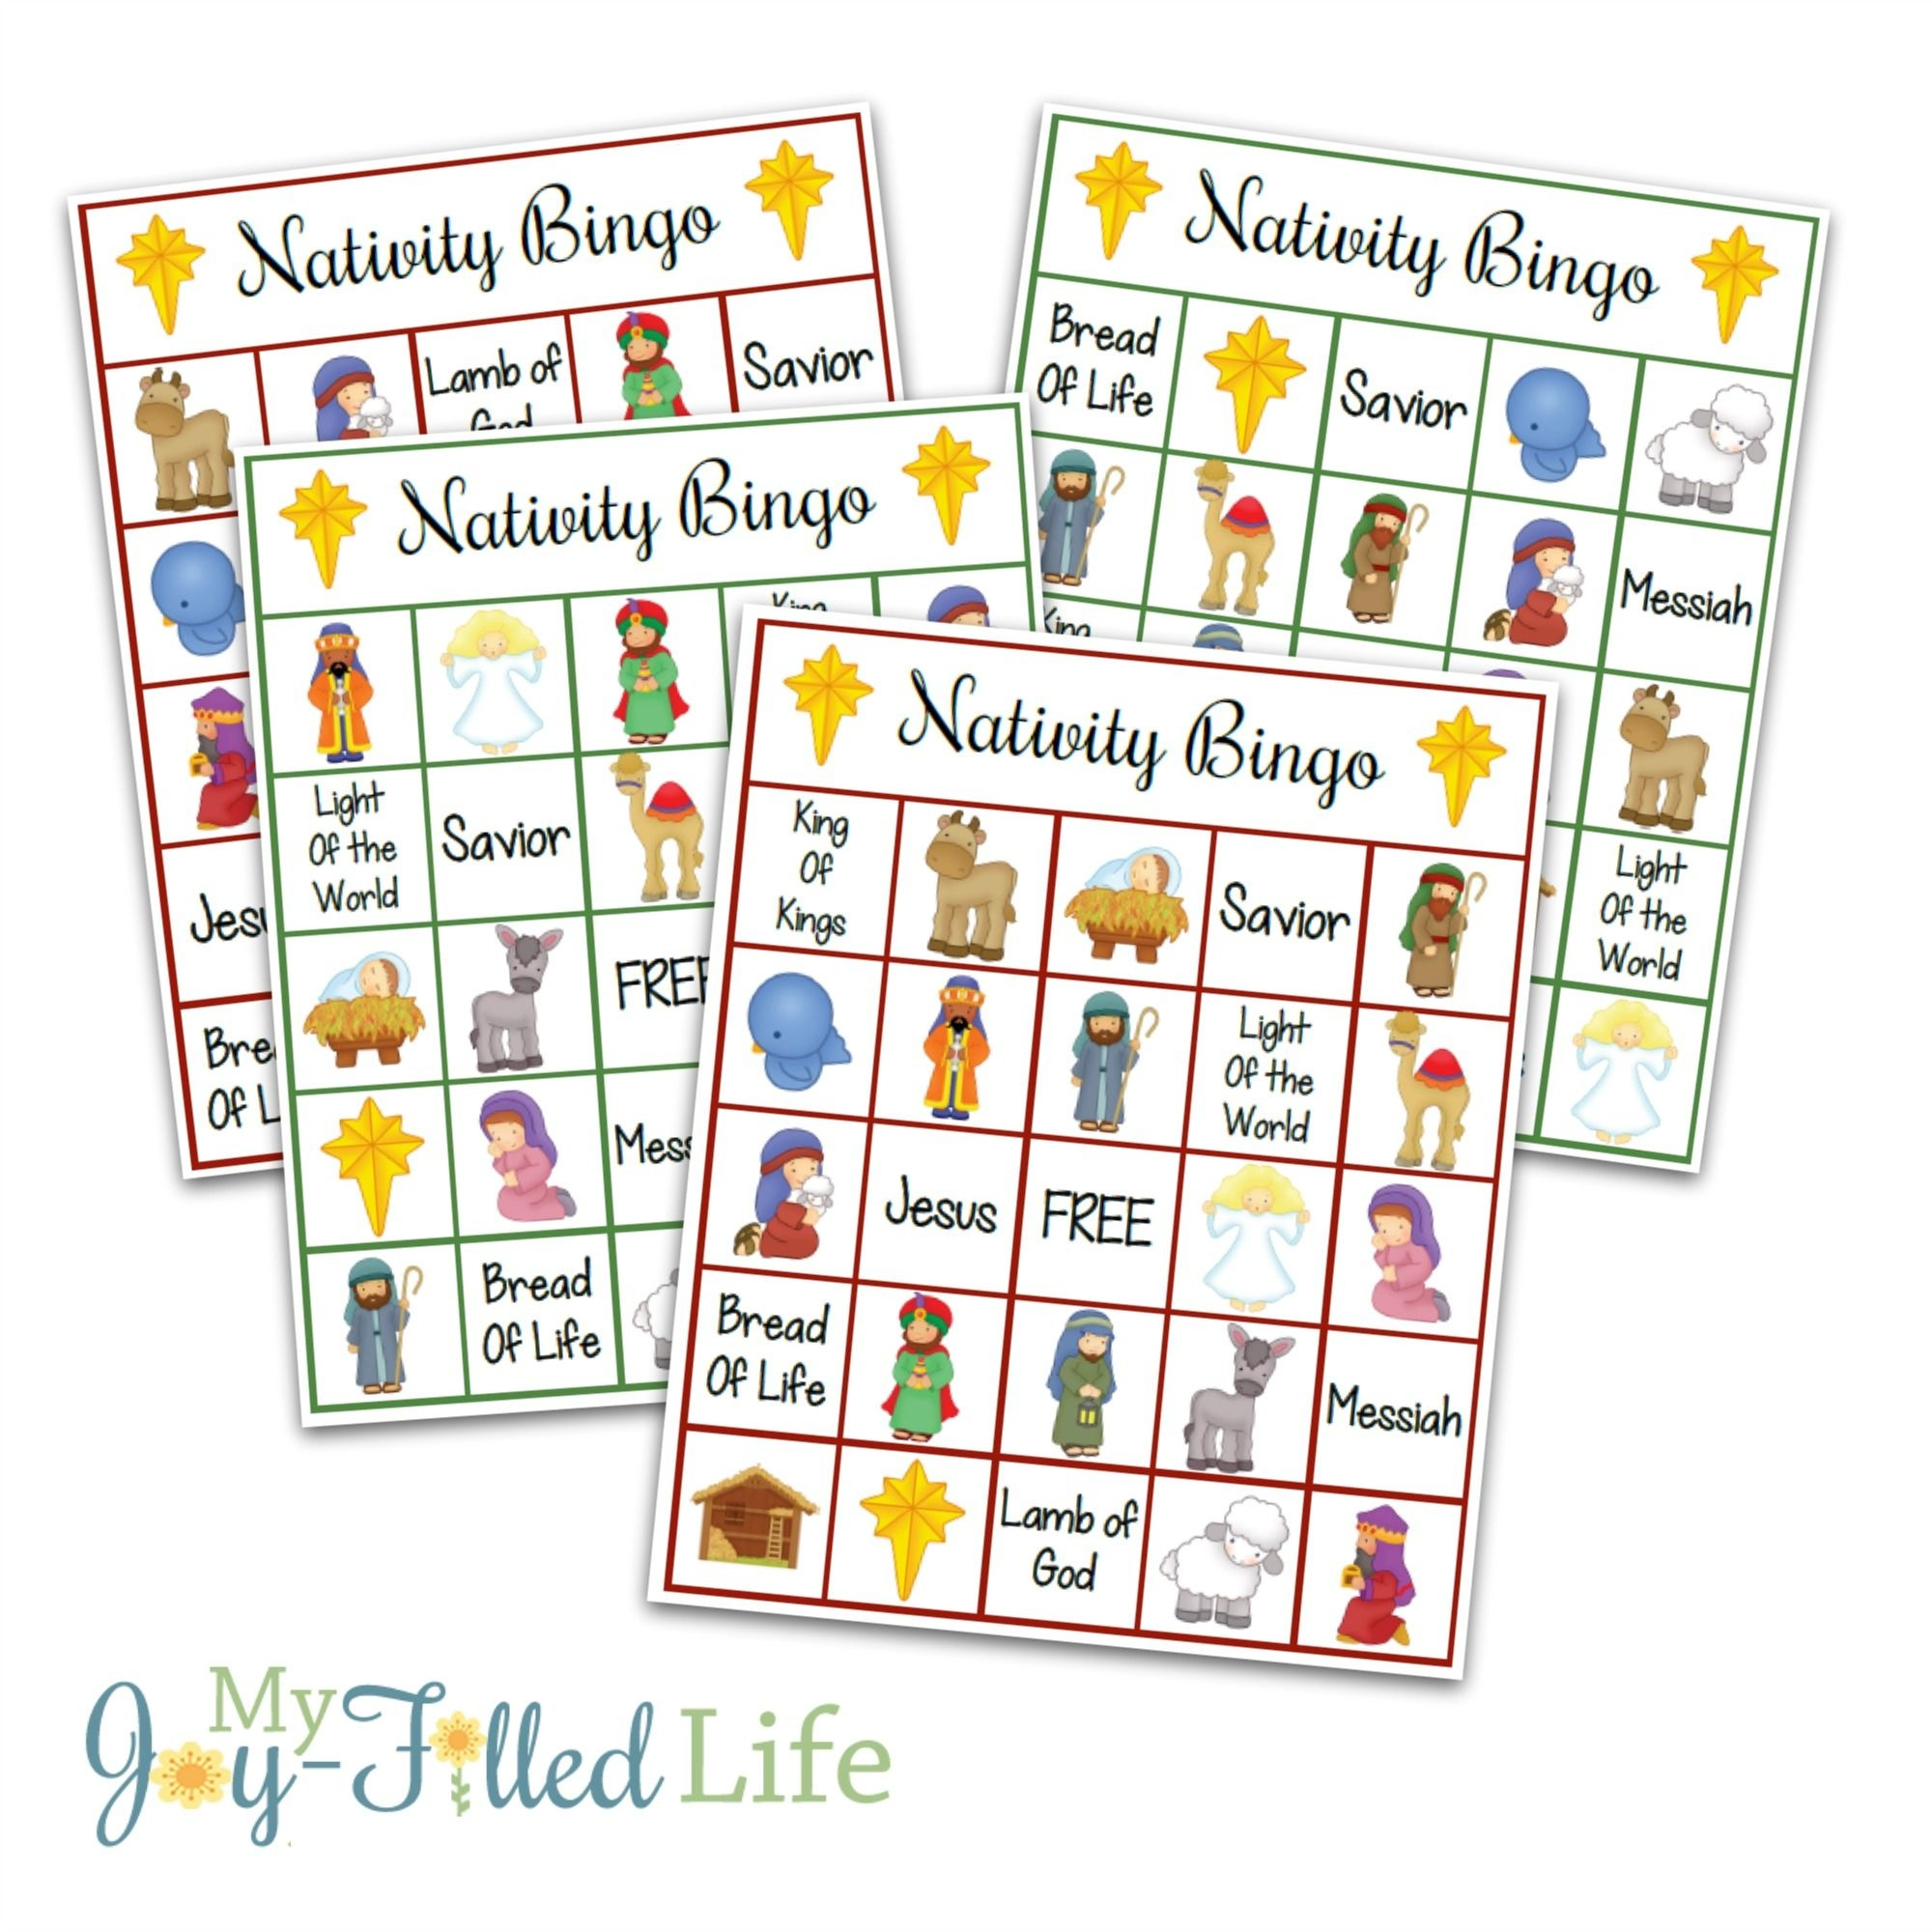 Printable Nativity Bingo Game | Games | Printable Christmas Games - Free Printable Bible Bingo For Preschoolers